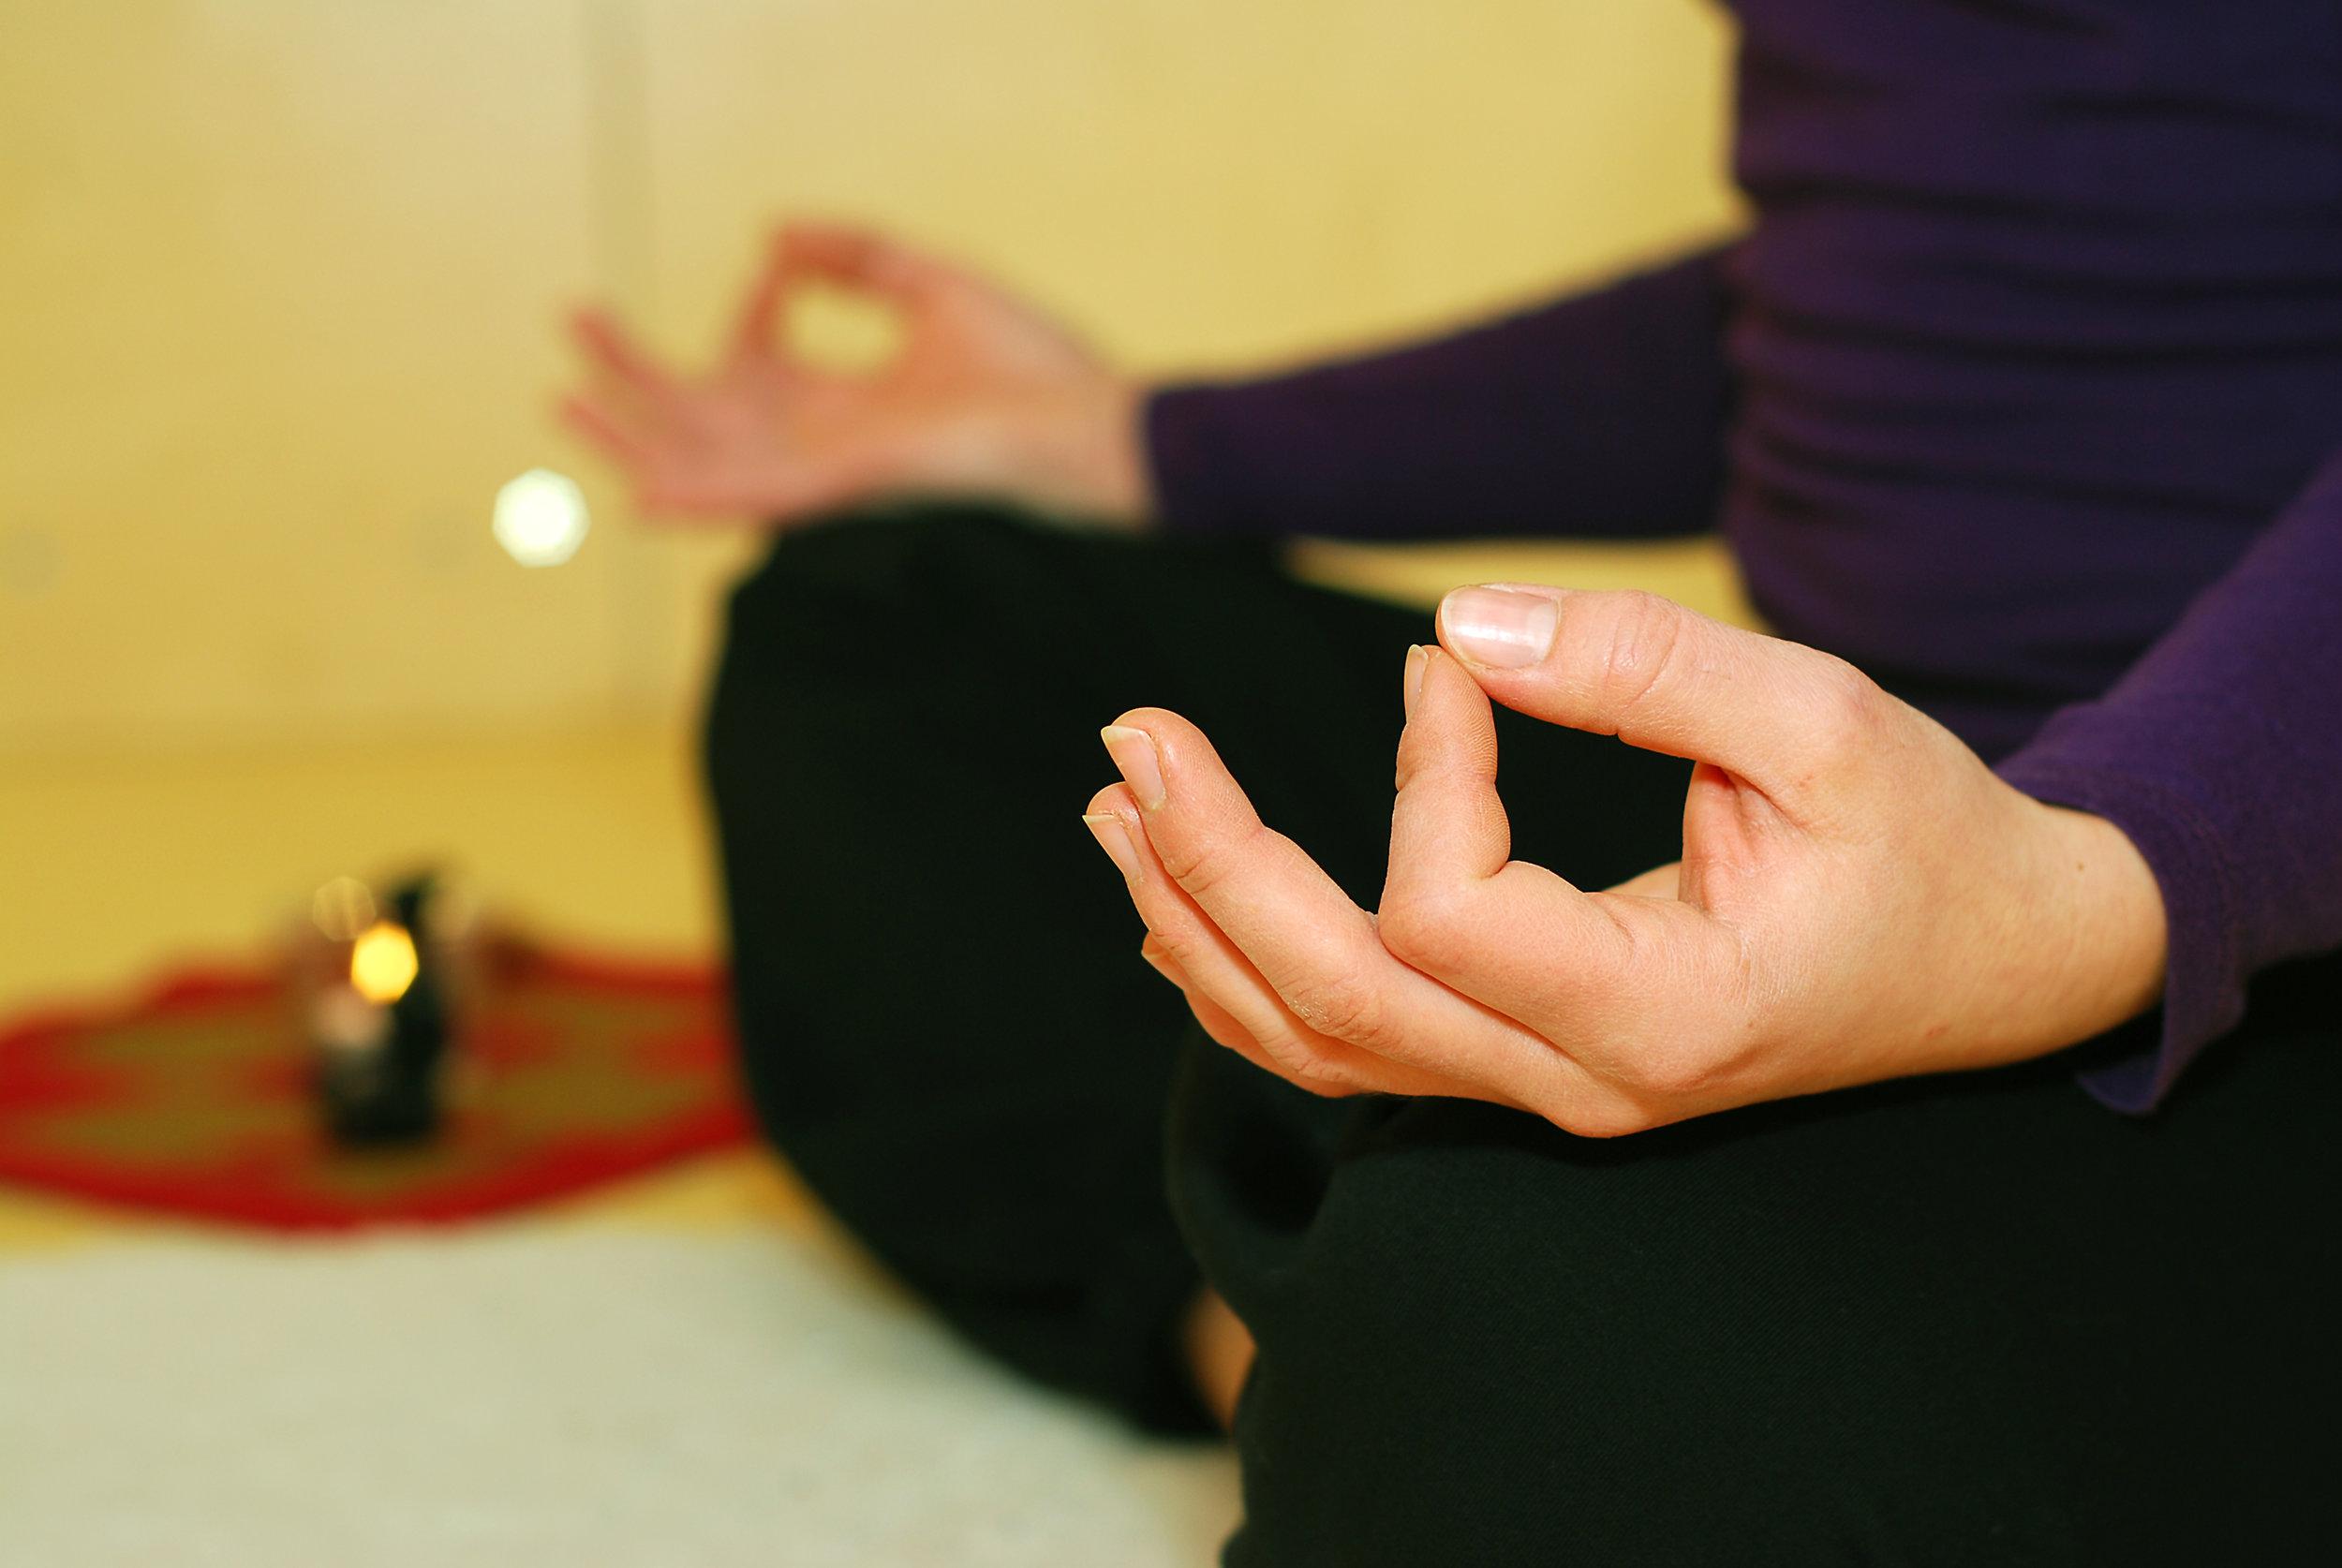 spirit-body-exploration-living-forward-whole-doralee-grindler-katonah-psychologist.jpg